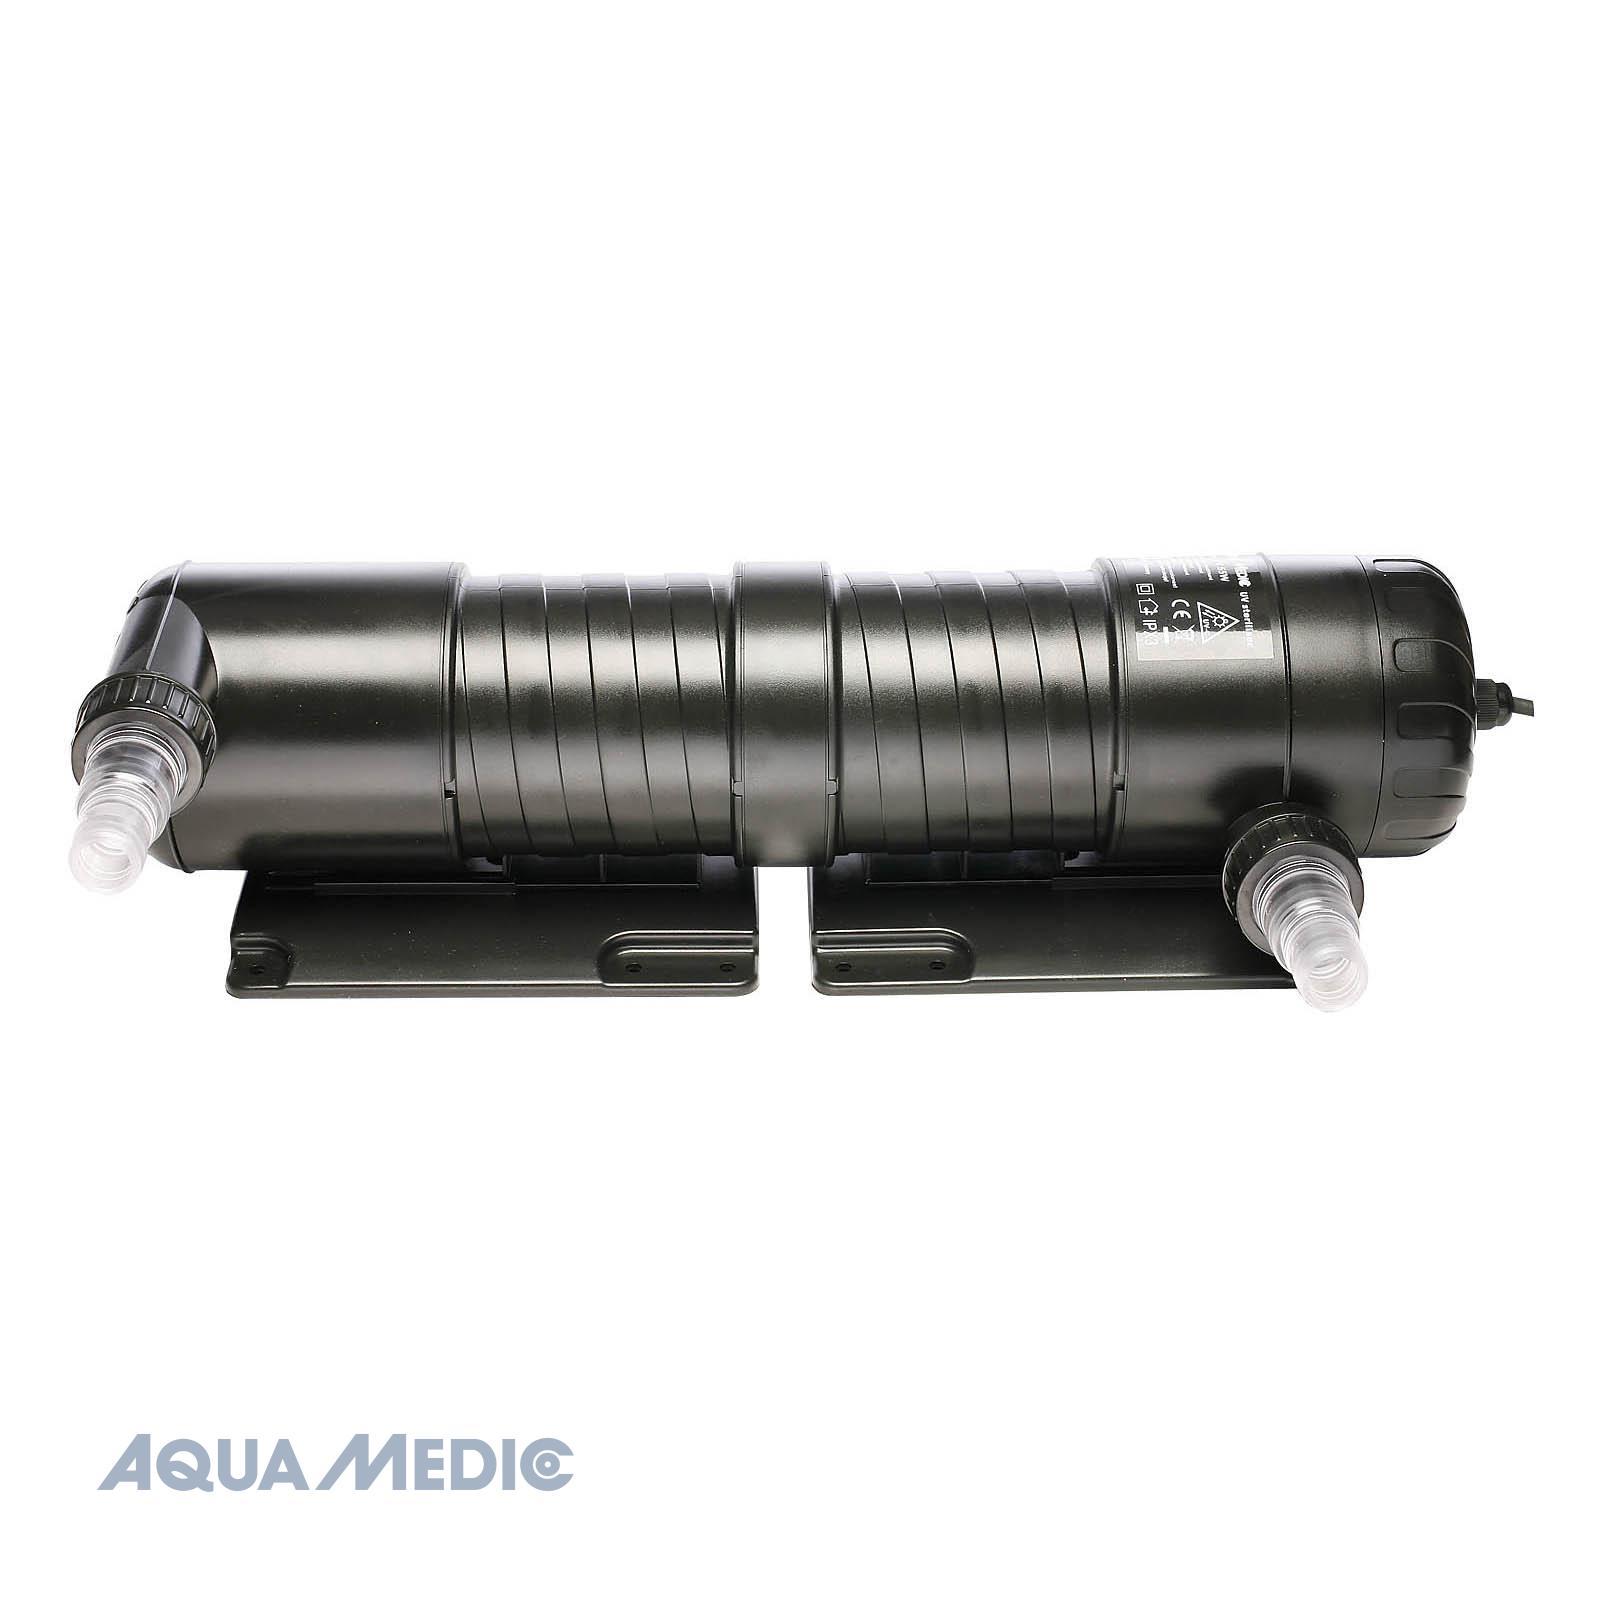 Aquamedic Uv-C Sterilizor Helix Max 36w